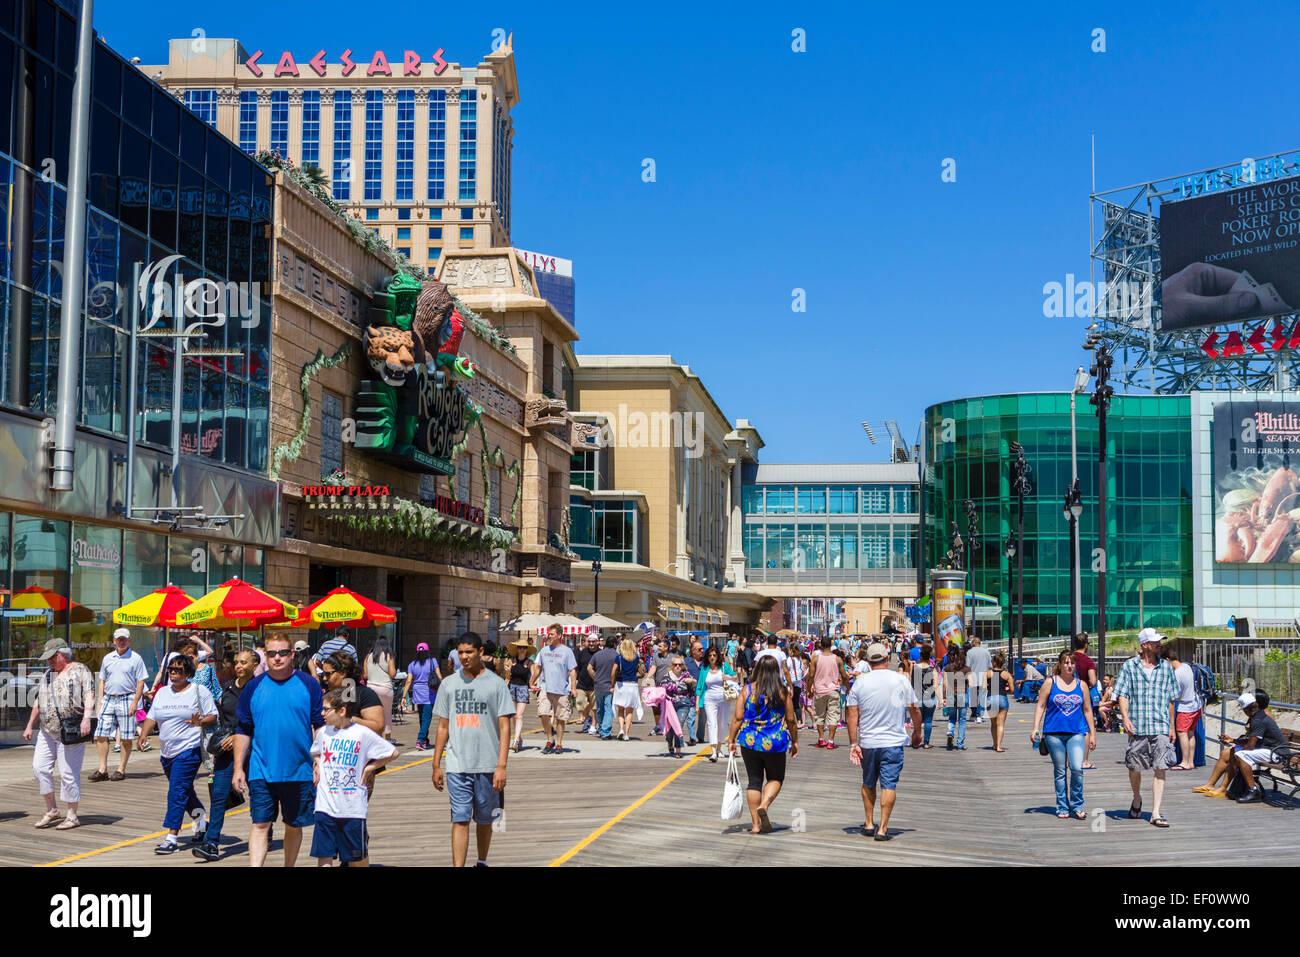 The boardwalk in Atlantic City, New Jersey, USA - Stock Image